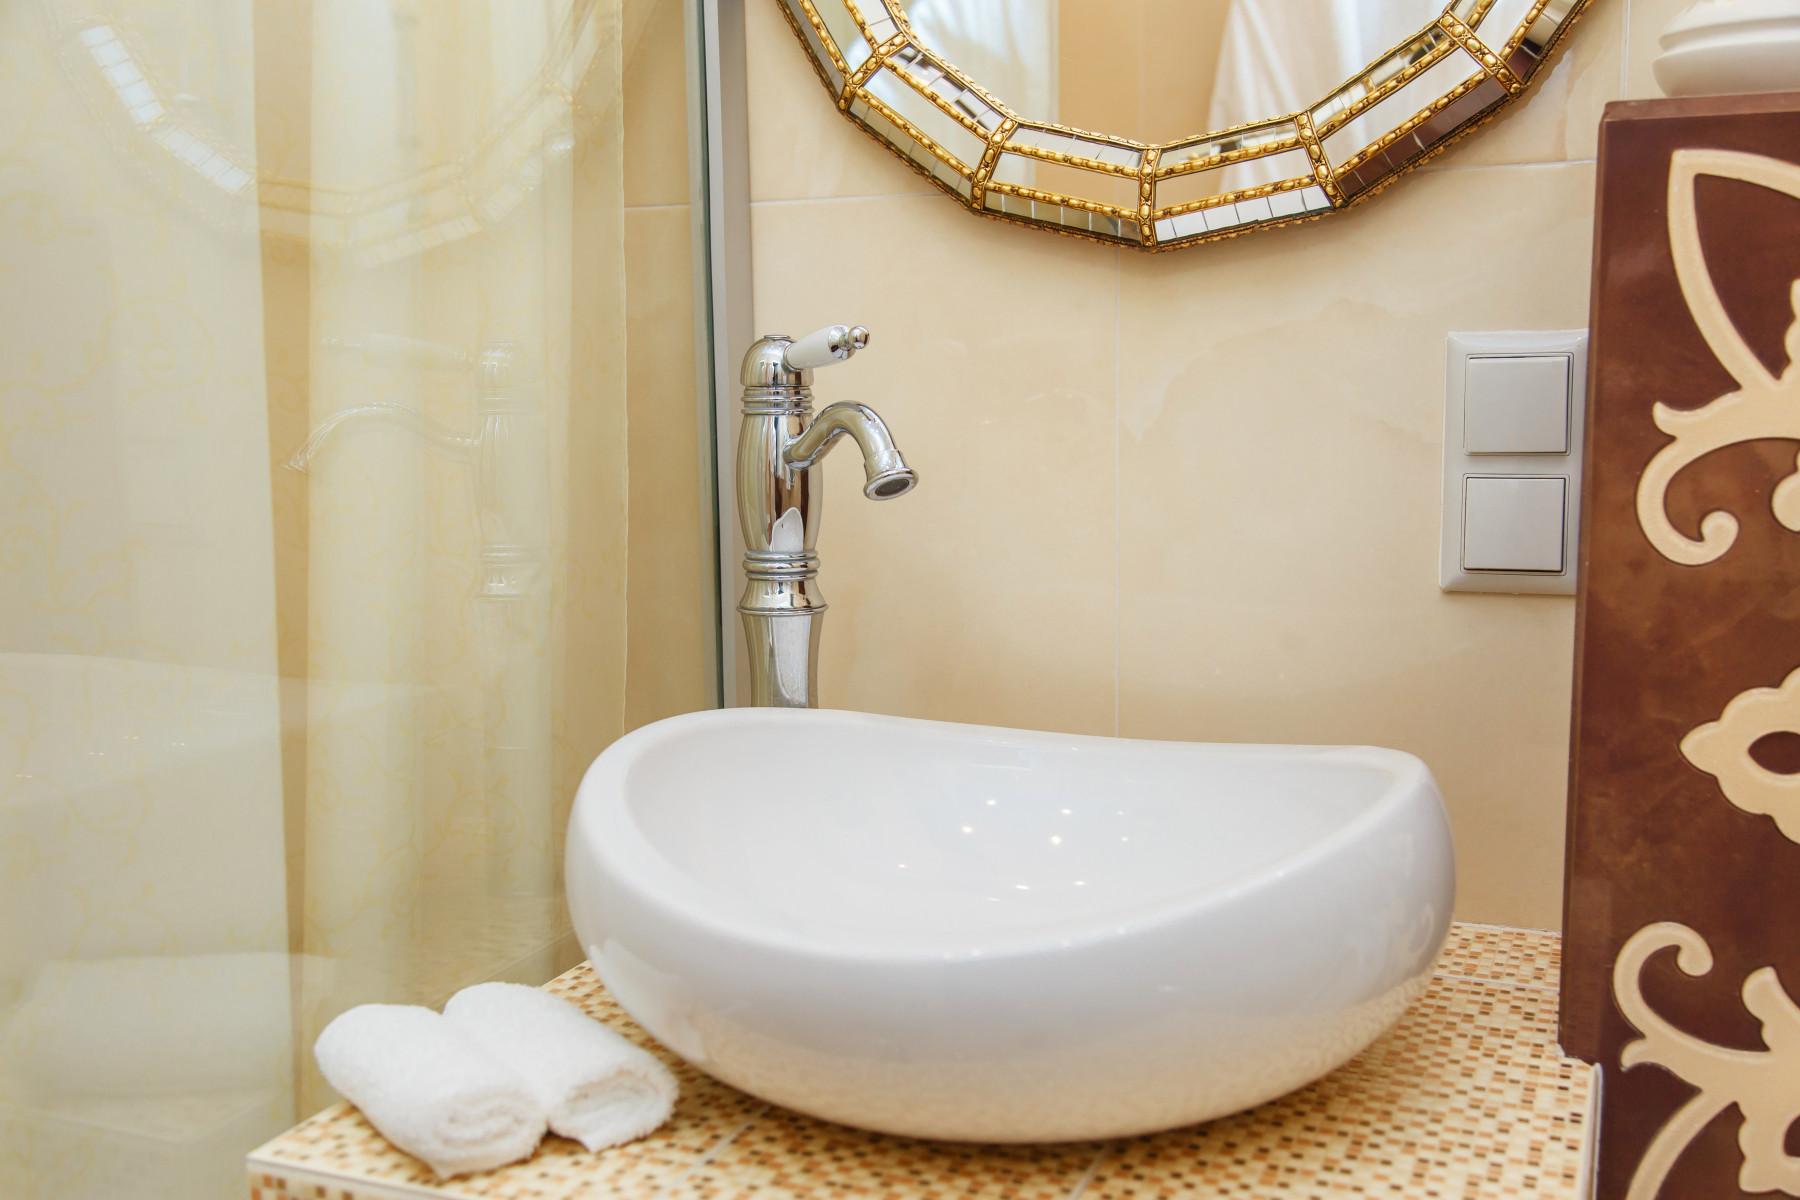 bathroom safety - Tim Kyle